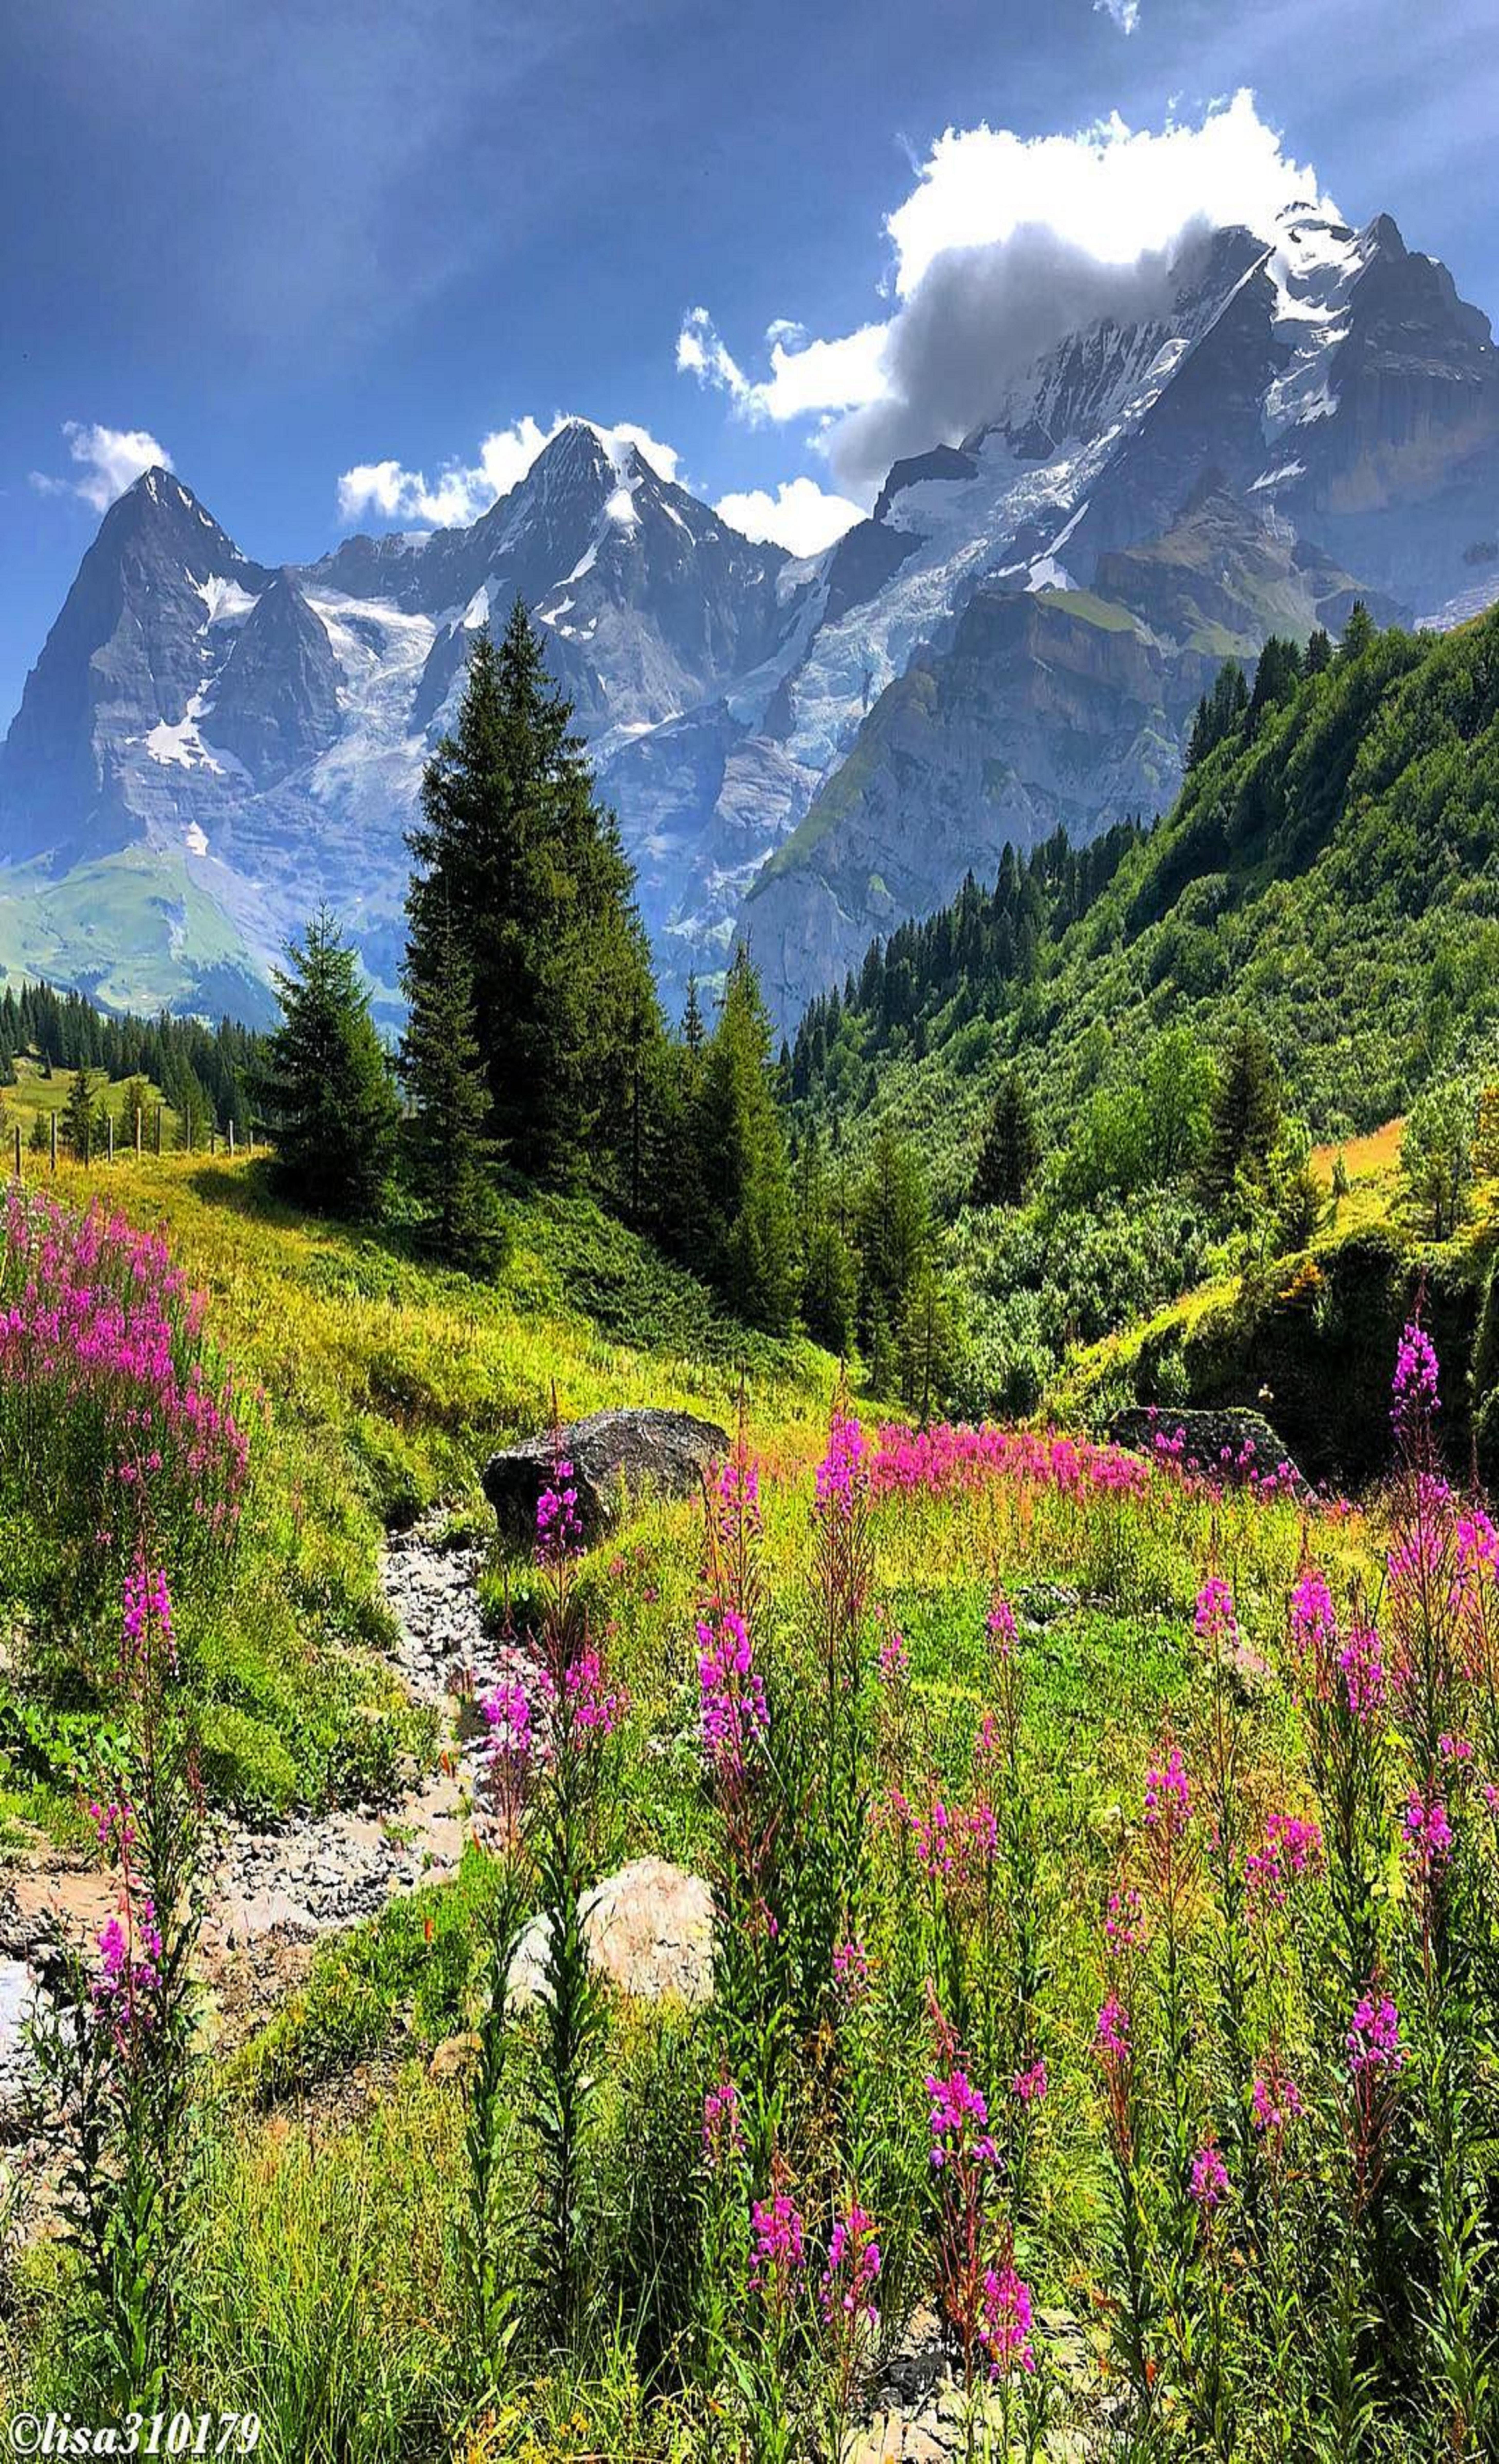 Pin By Ivanka Kostova On Nature Beautiful Landscapes Landscape Nature Photography